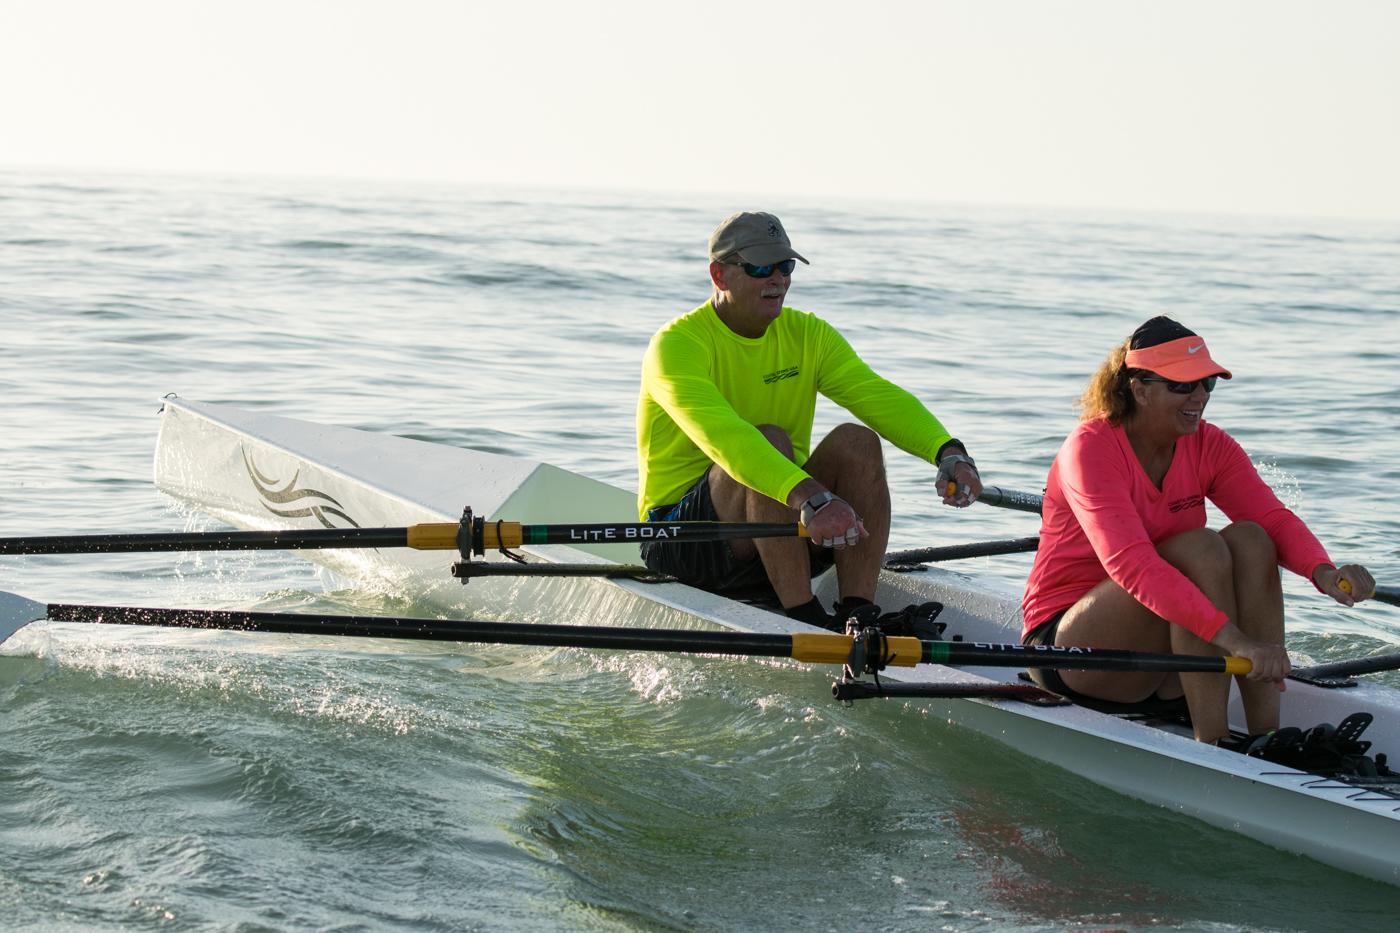 rowing_double-9.jpg